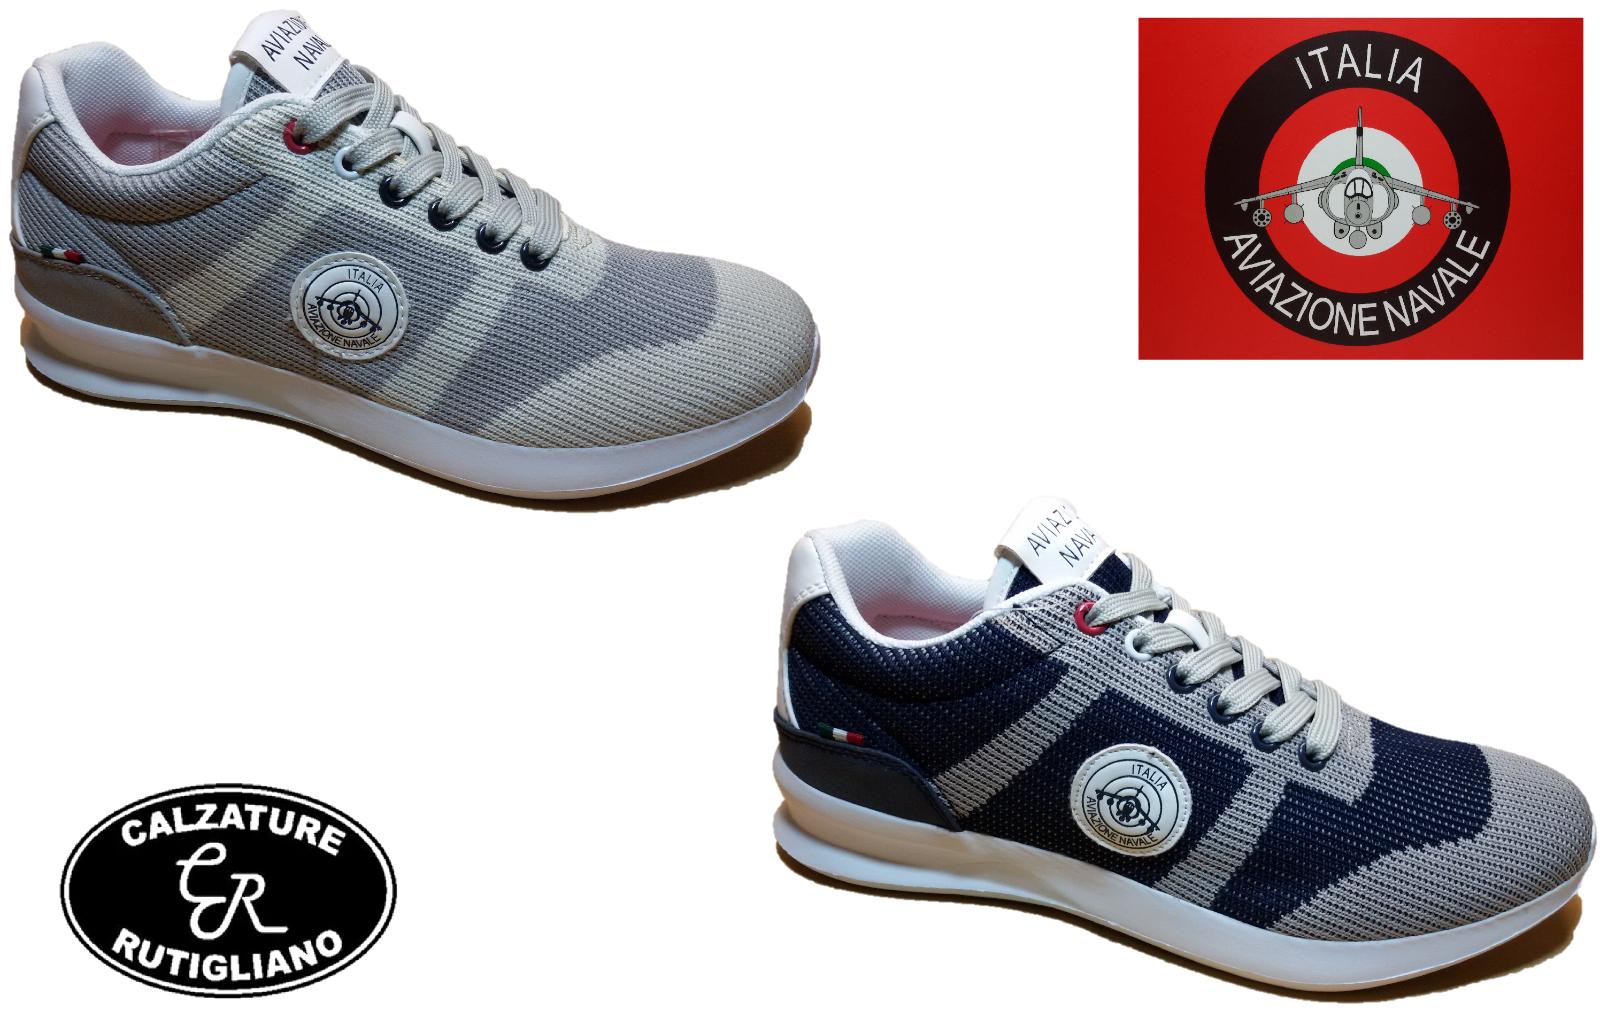 AVIAZIONE NAVALE chaussures hommes baskets TESSUTO RETE - AN280